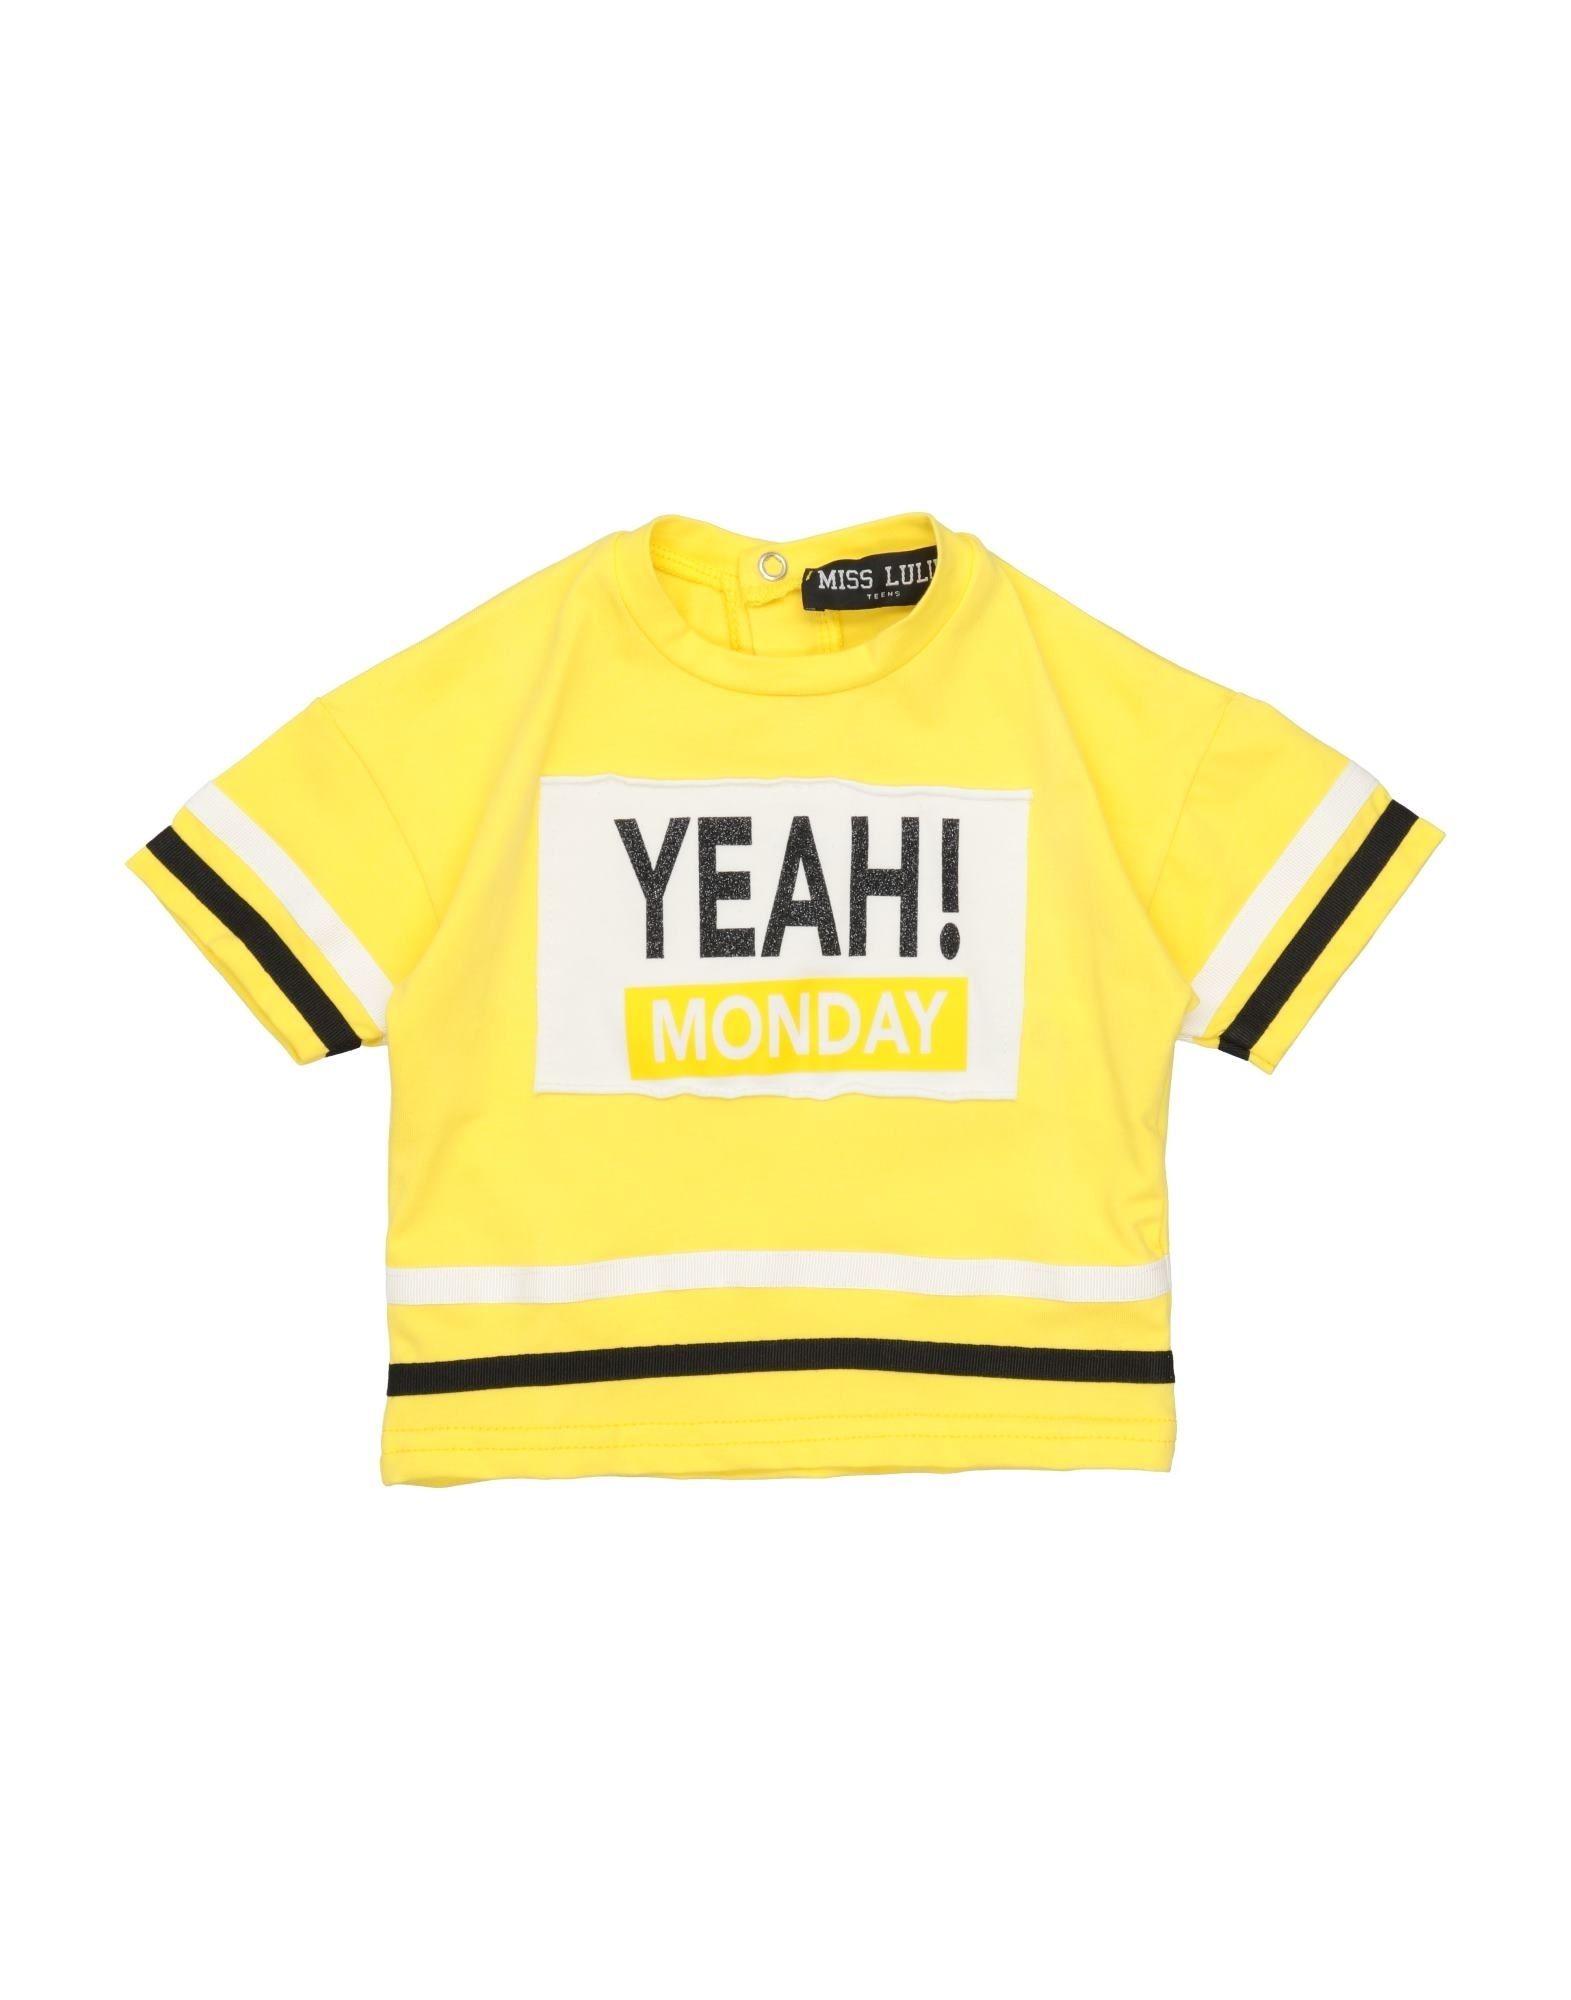 Miss Lulù Kids' T-shirts In Yellow